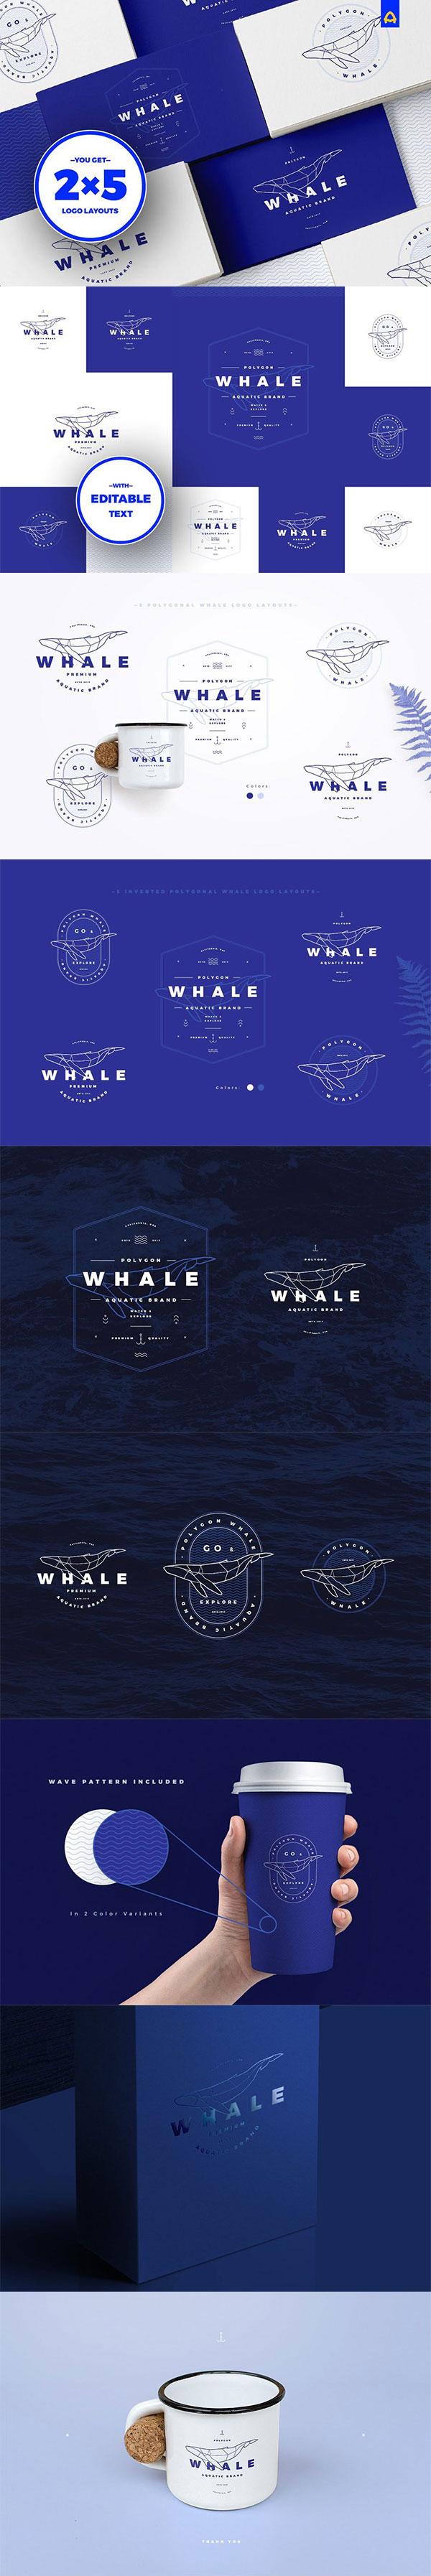 多边形鲸鱼LOGO